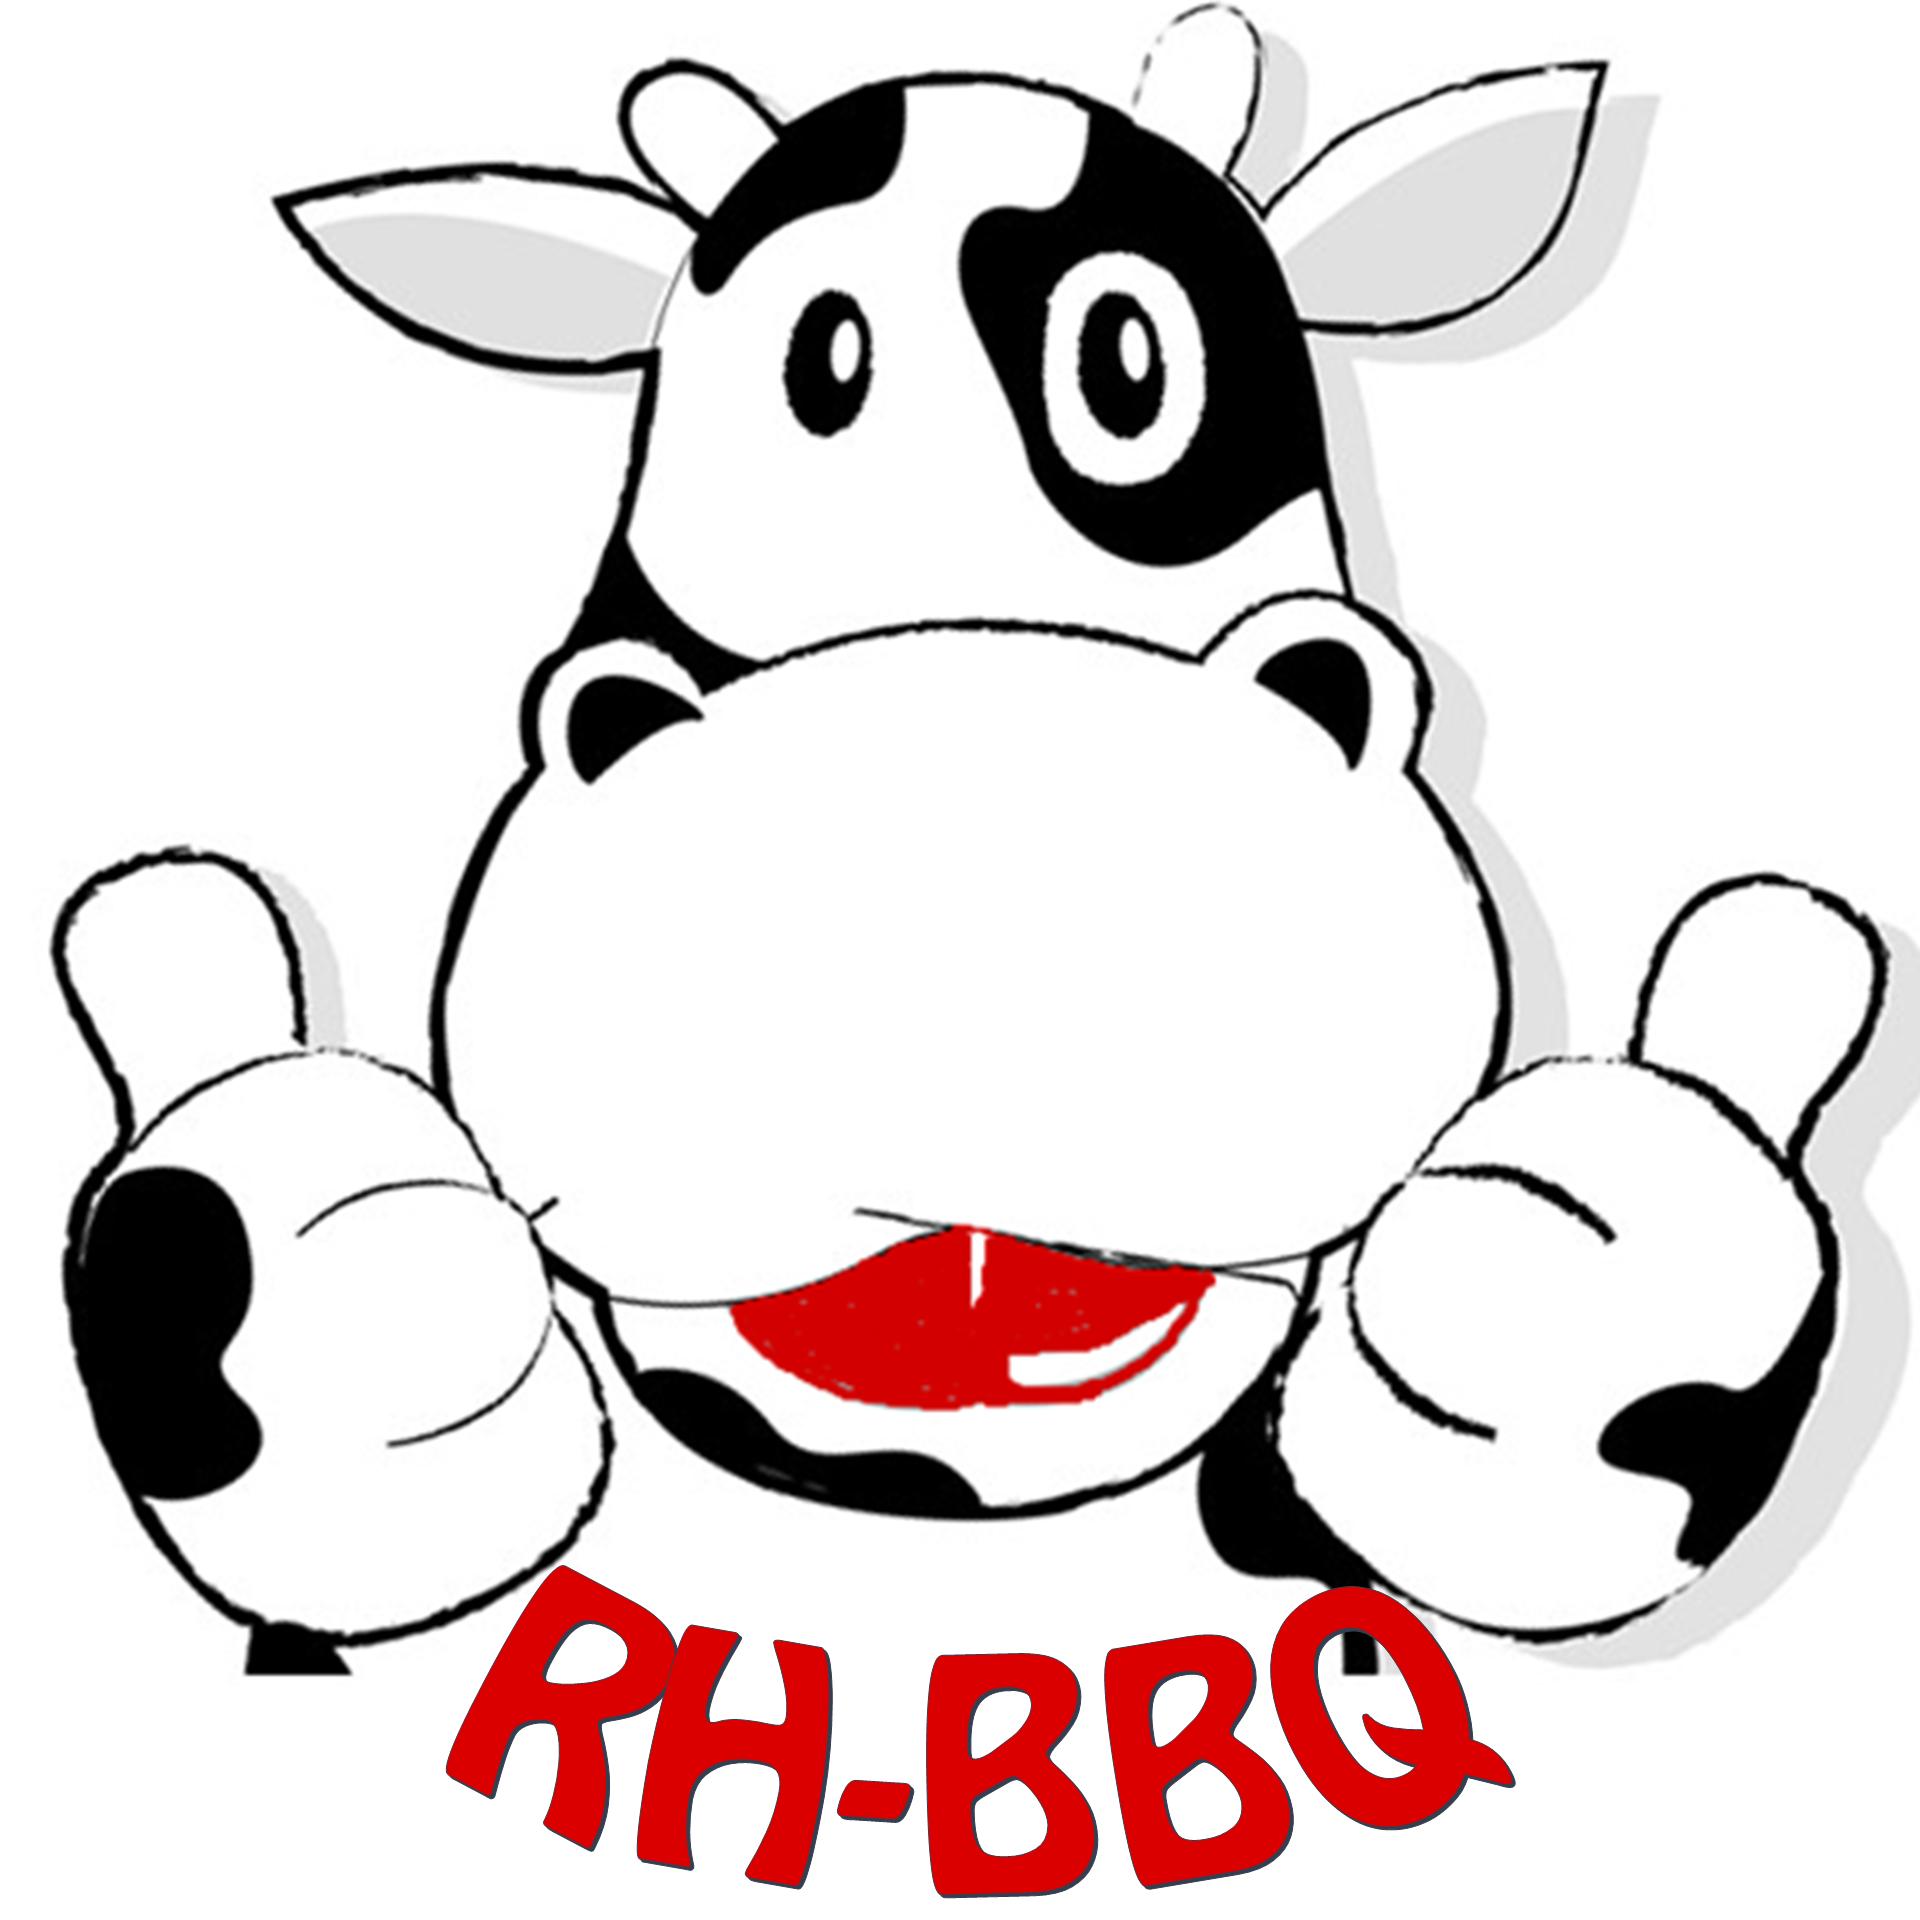 RH BBQ 羅蘭崗RH韓國烤肉無限吃到飽